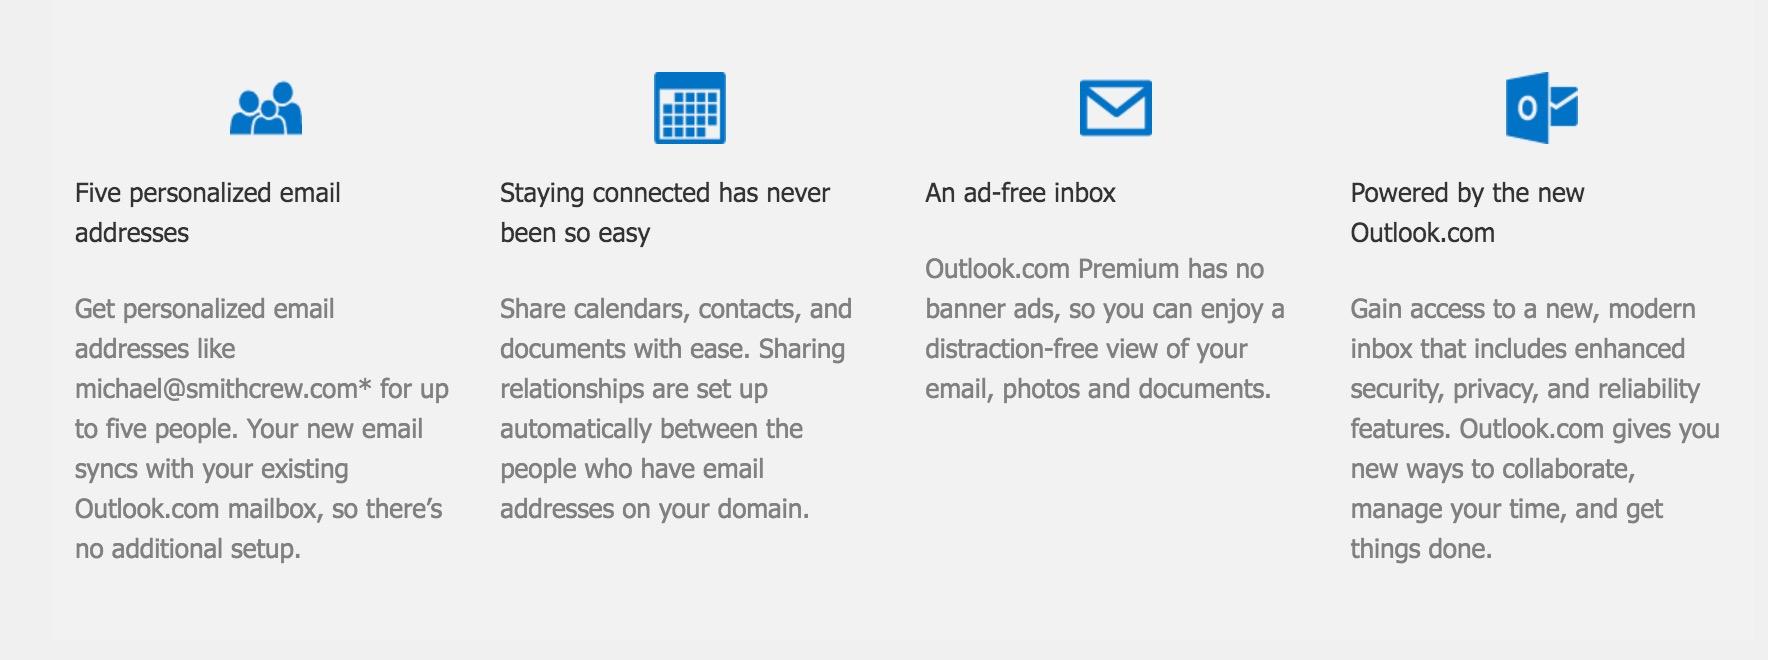 Outlook-Premium_features